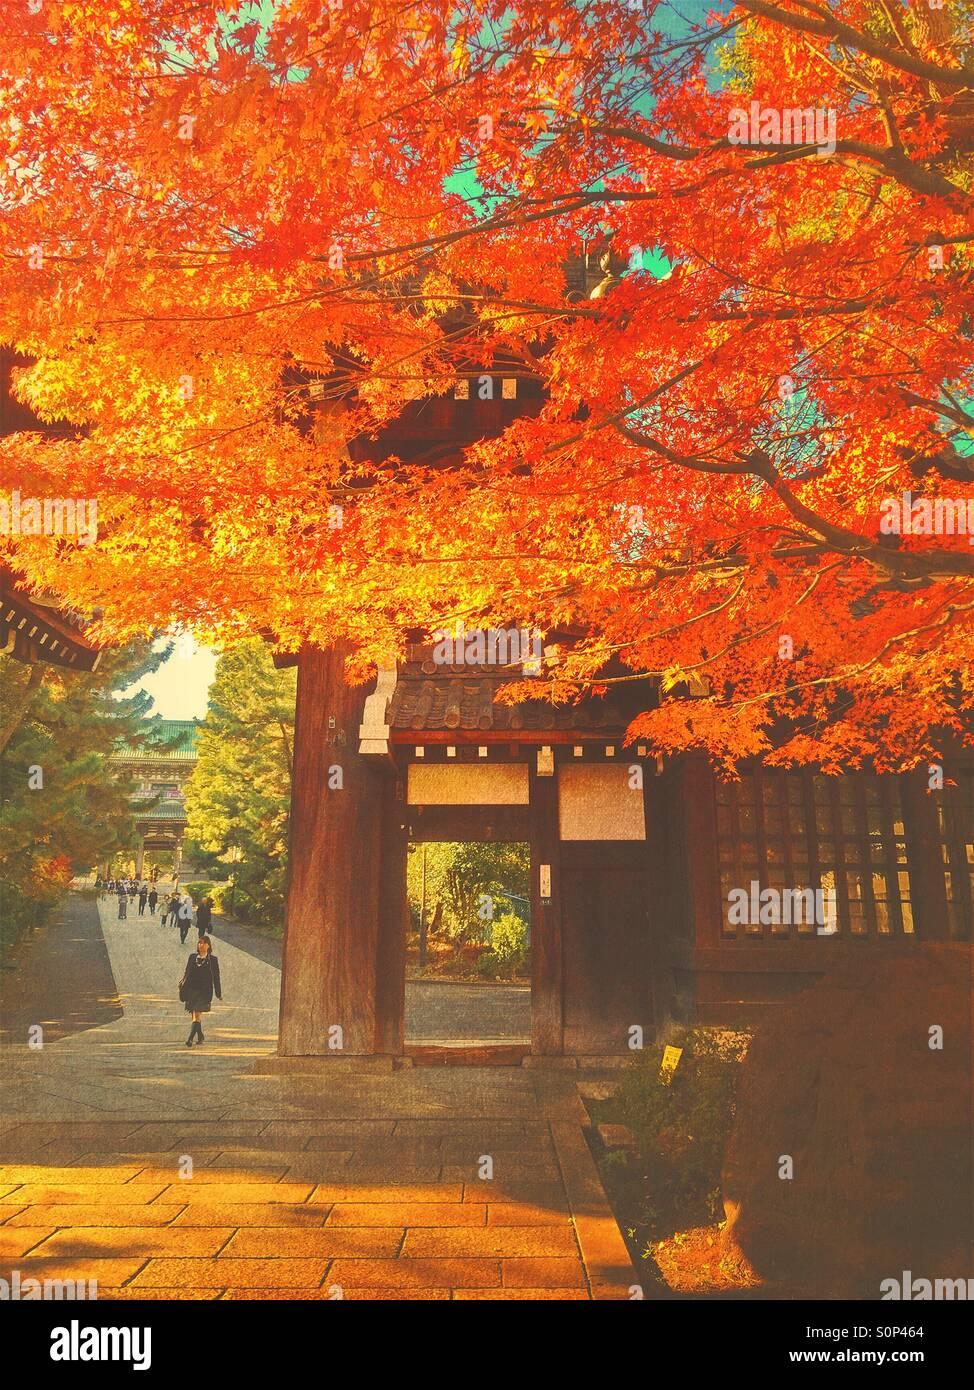 Beautiful fall scene with people and vibrant autumn foliage at Soji-ji Buddhist temple in Yokohama, Japan. VintageStock Photo